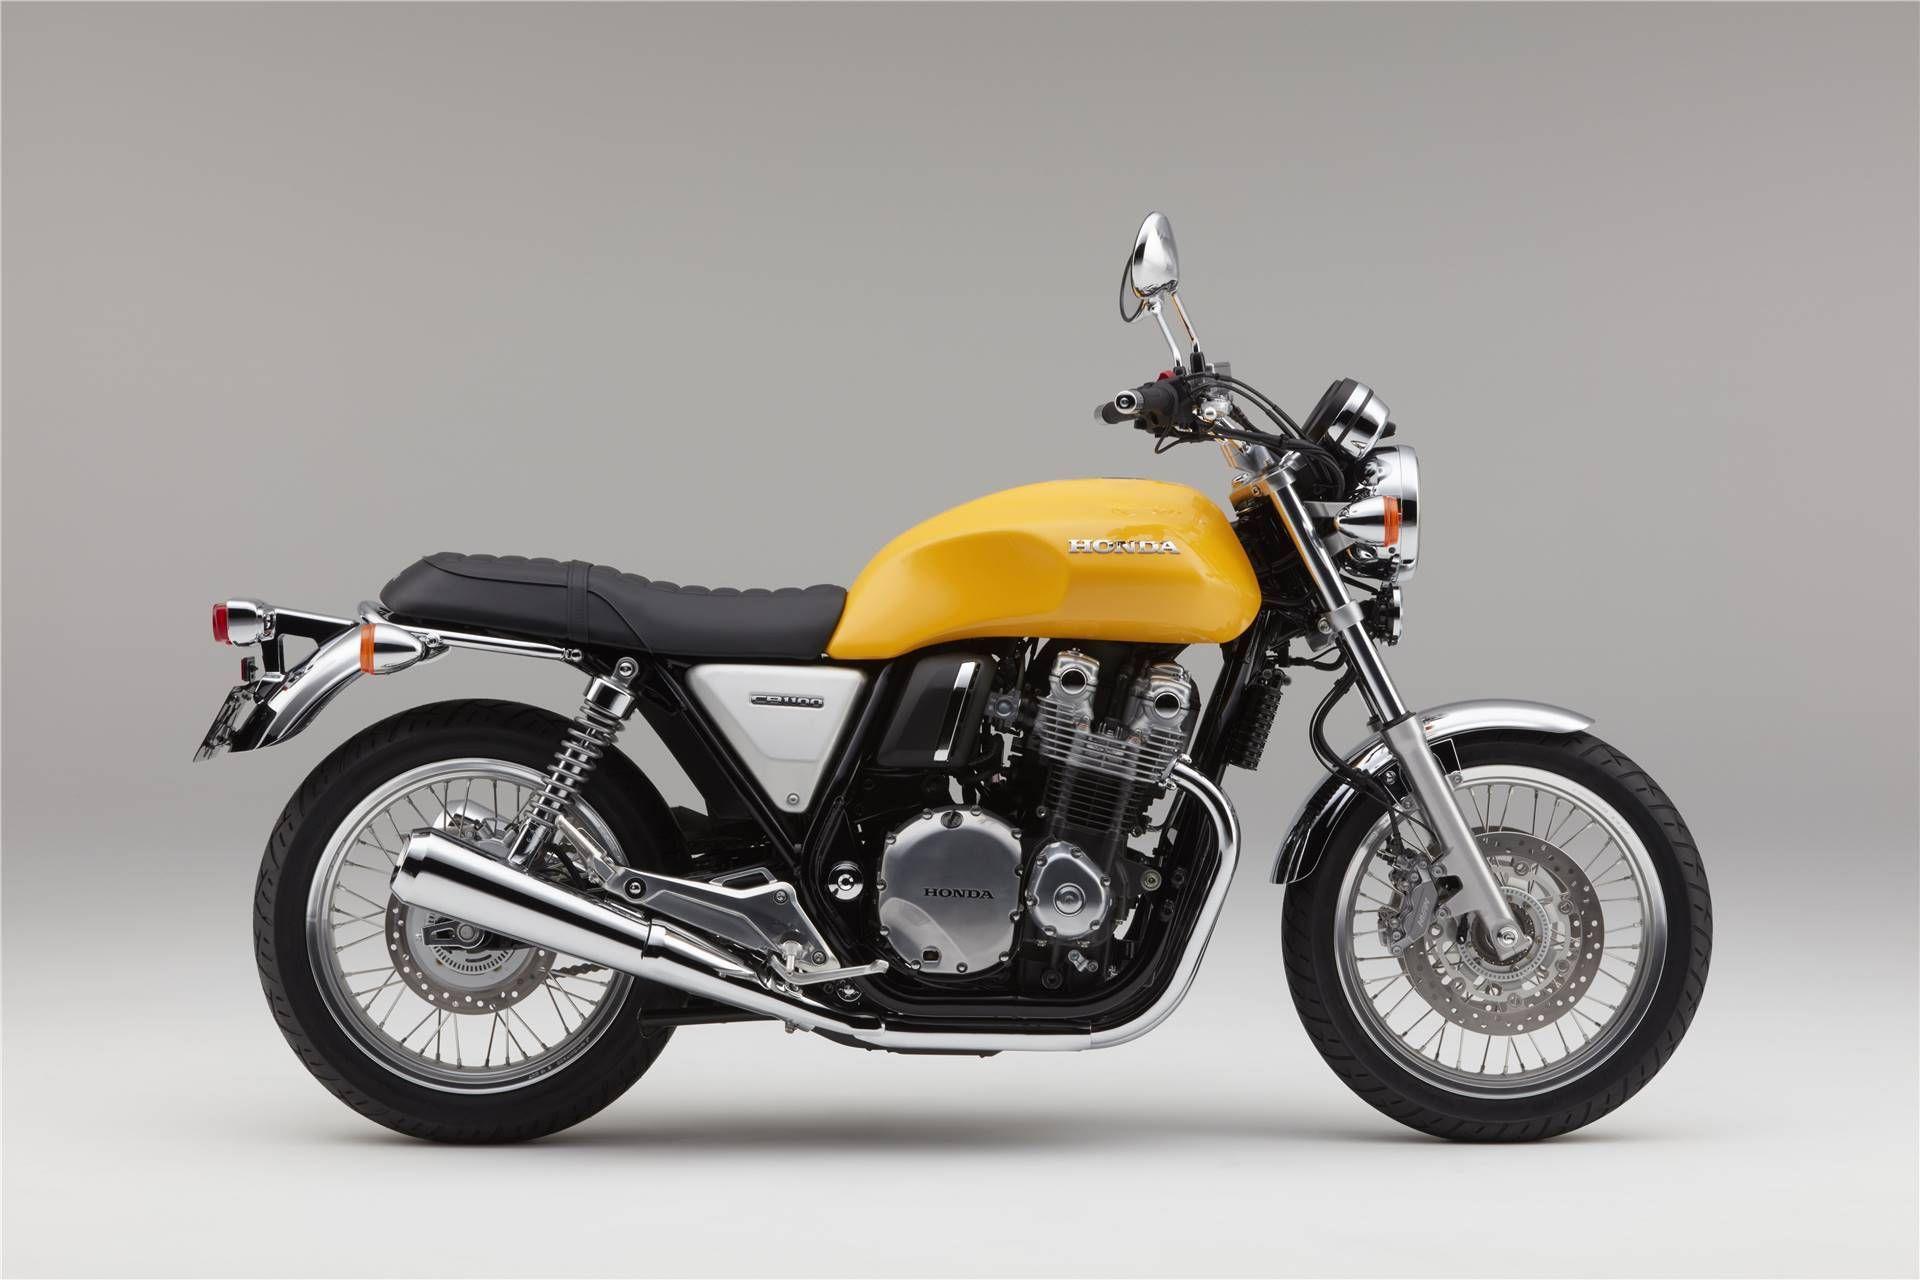 2016 honda cb1100 concept review motorcycles cb cafe racer vintage retro style bike cb 1100 honda motorcycles fan pinterest honda vintage e